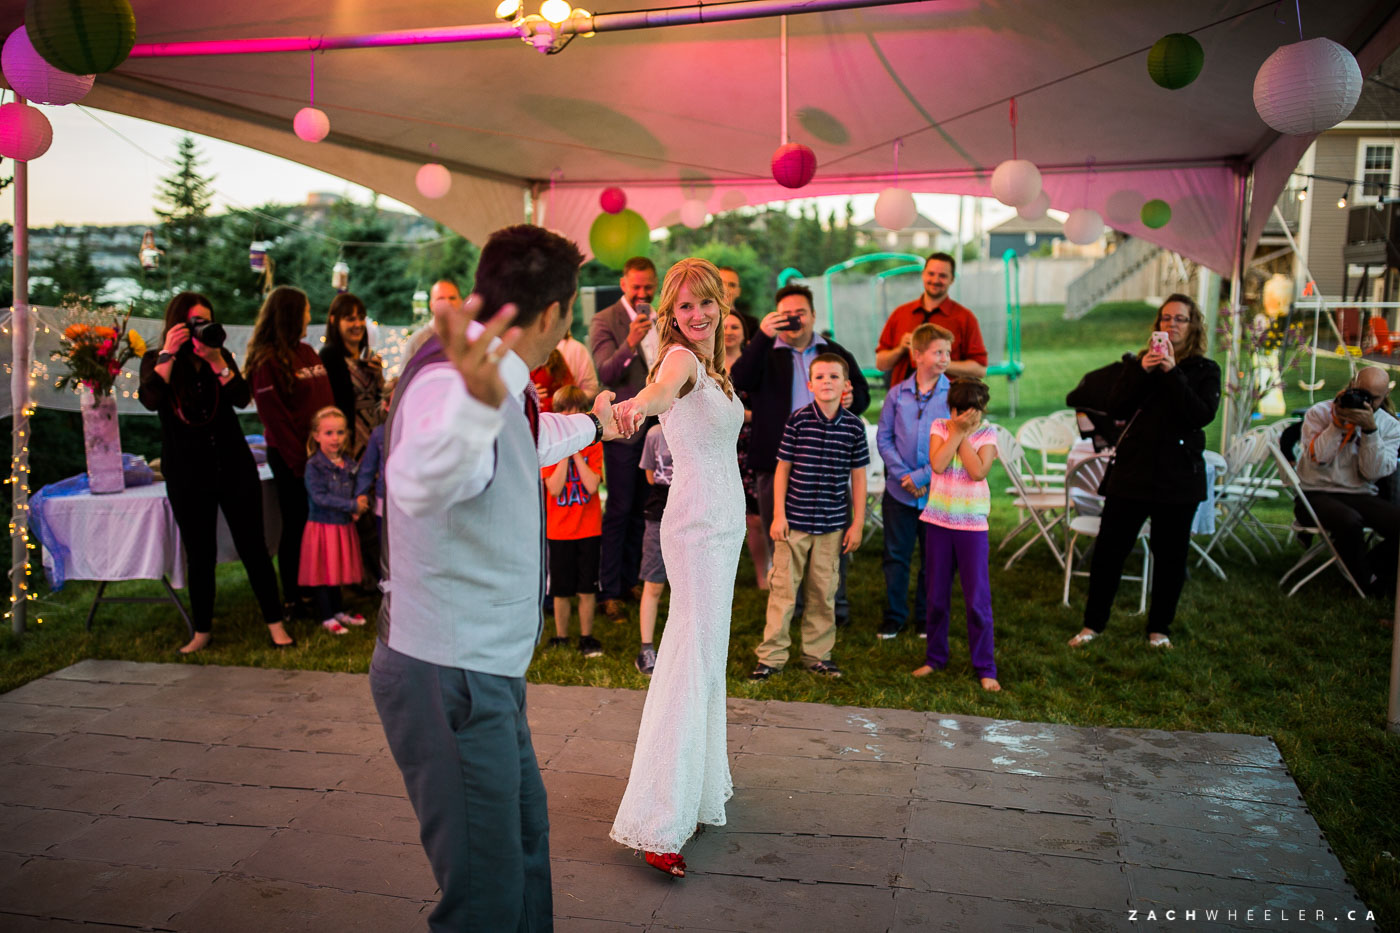 StJohns-Newfoundland-Backyard-Wedding-35